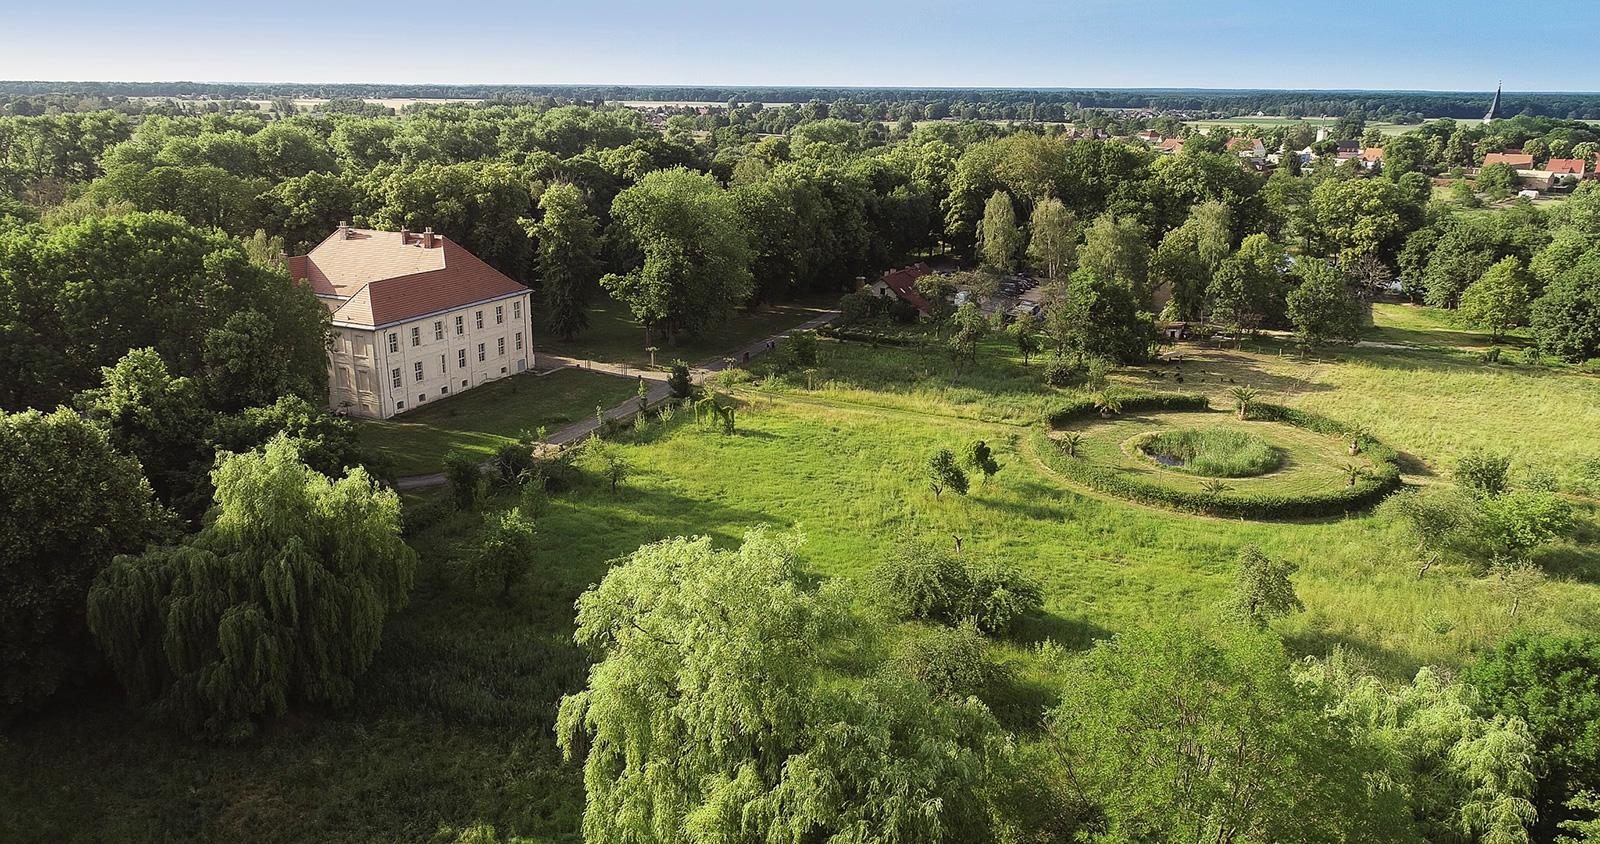 Aerial view of Schlossgut Schwante Sculpture Park. Courtesy of Schlossgut Schwante Sculpture Park.